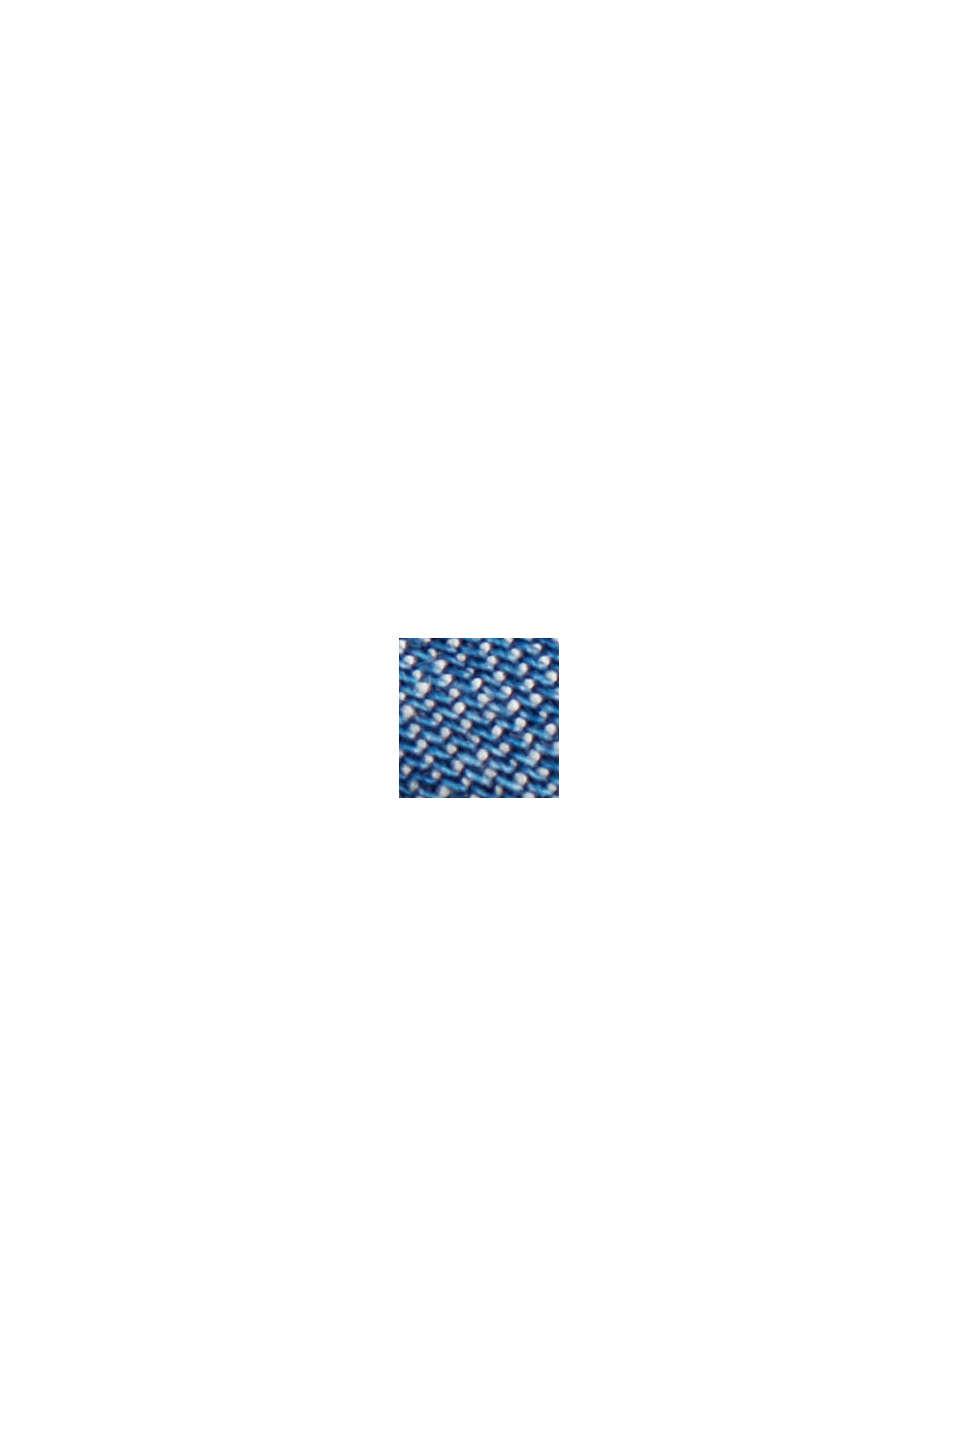 Van TENCEL™: denim blouse met ruches, BLUE MEDIUM WASHED, swatch